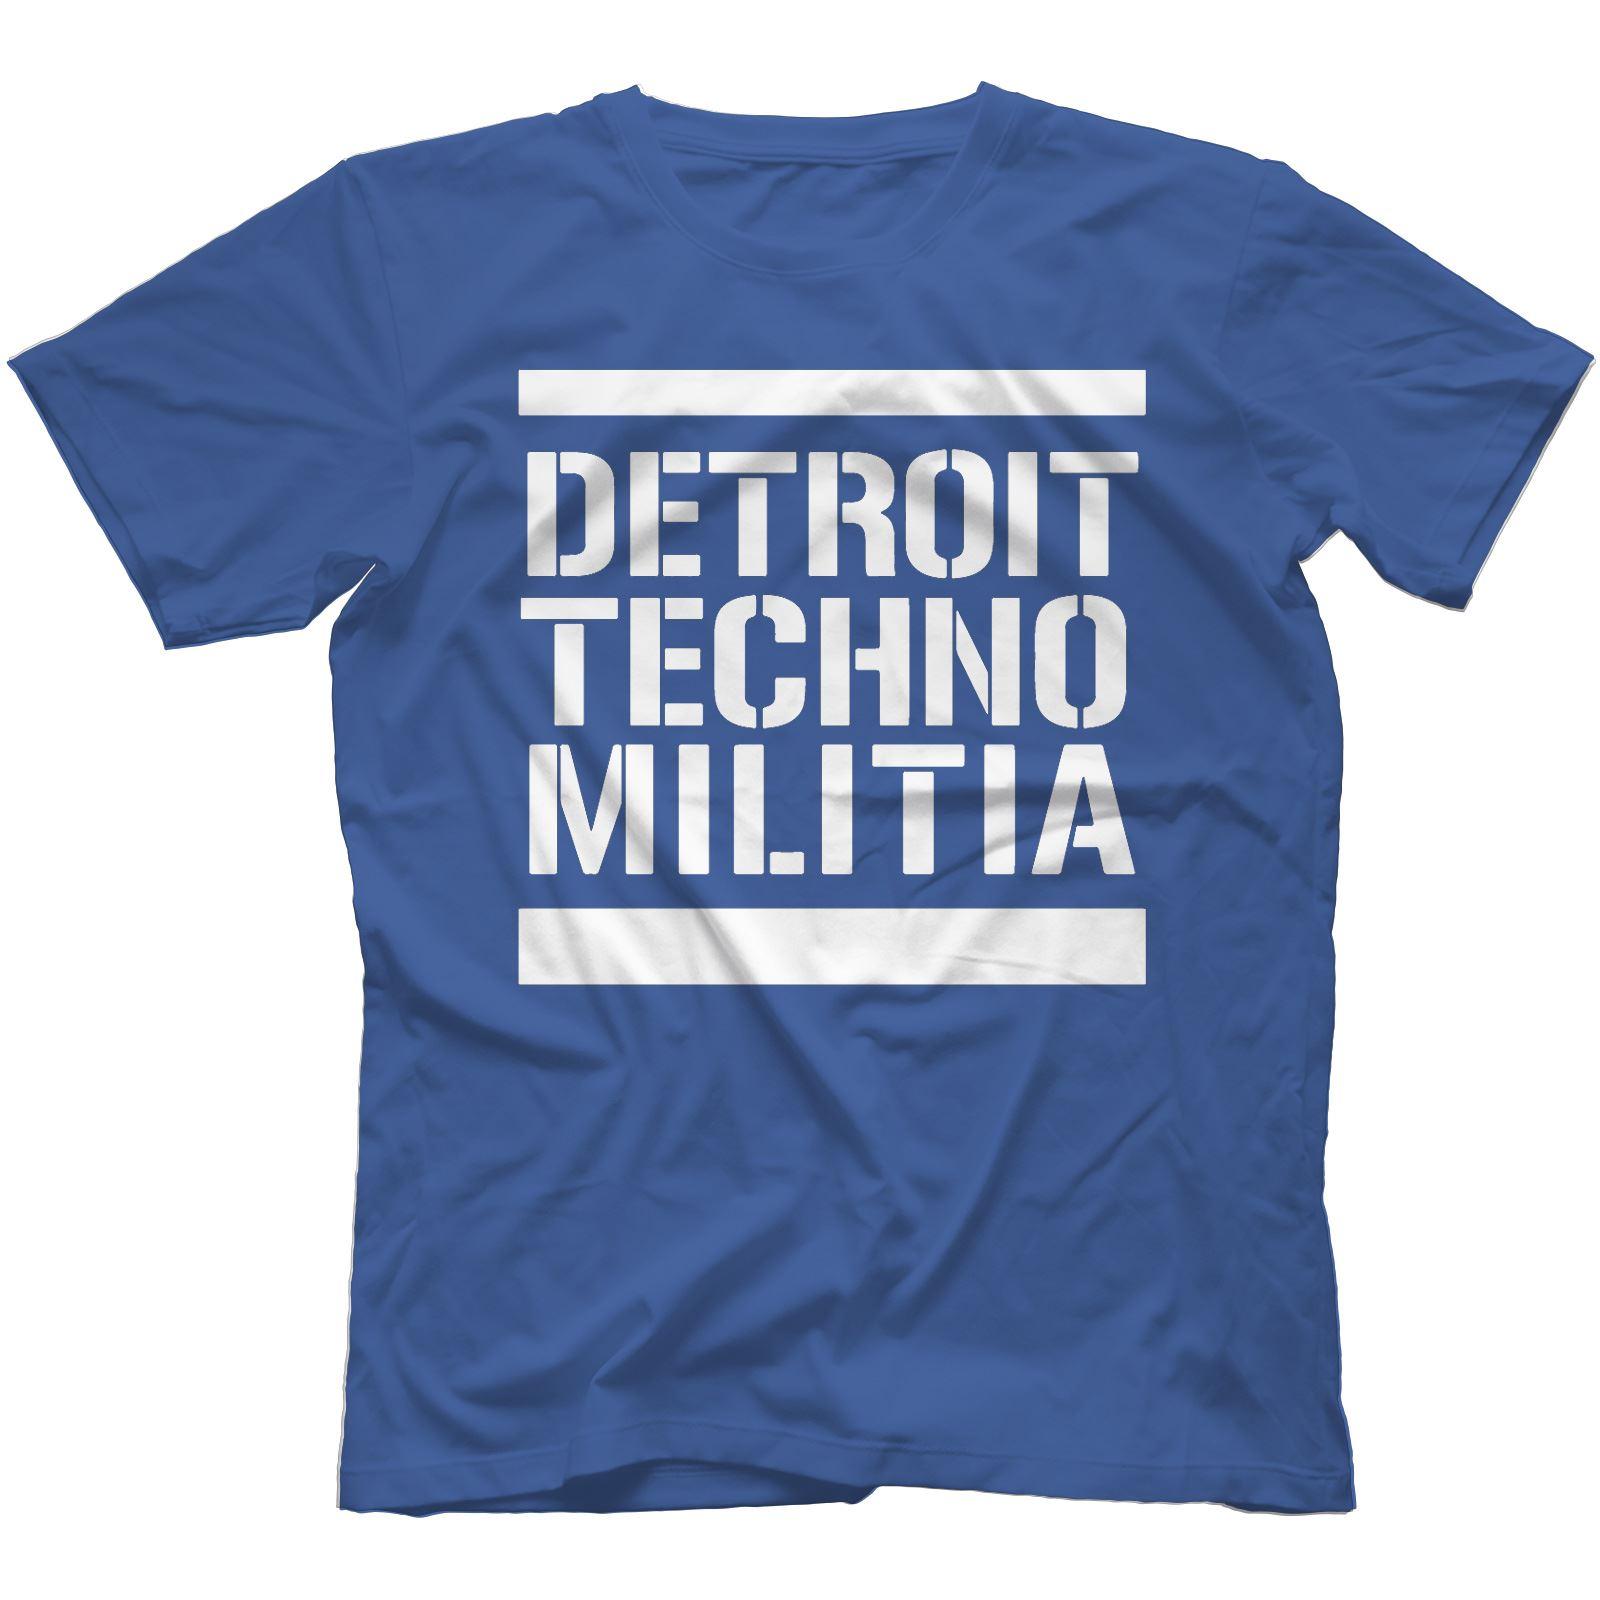 Detroit-Techno-Militia-T-Shirt-100-Cotton-Vinyl-909-Underground-Resistance Indexbild 36